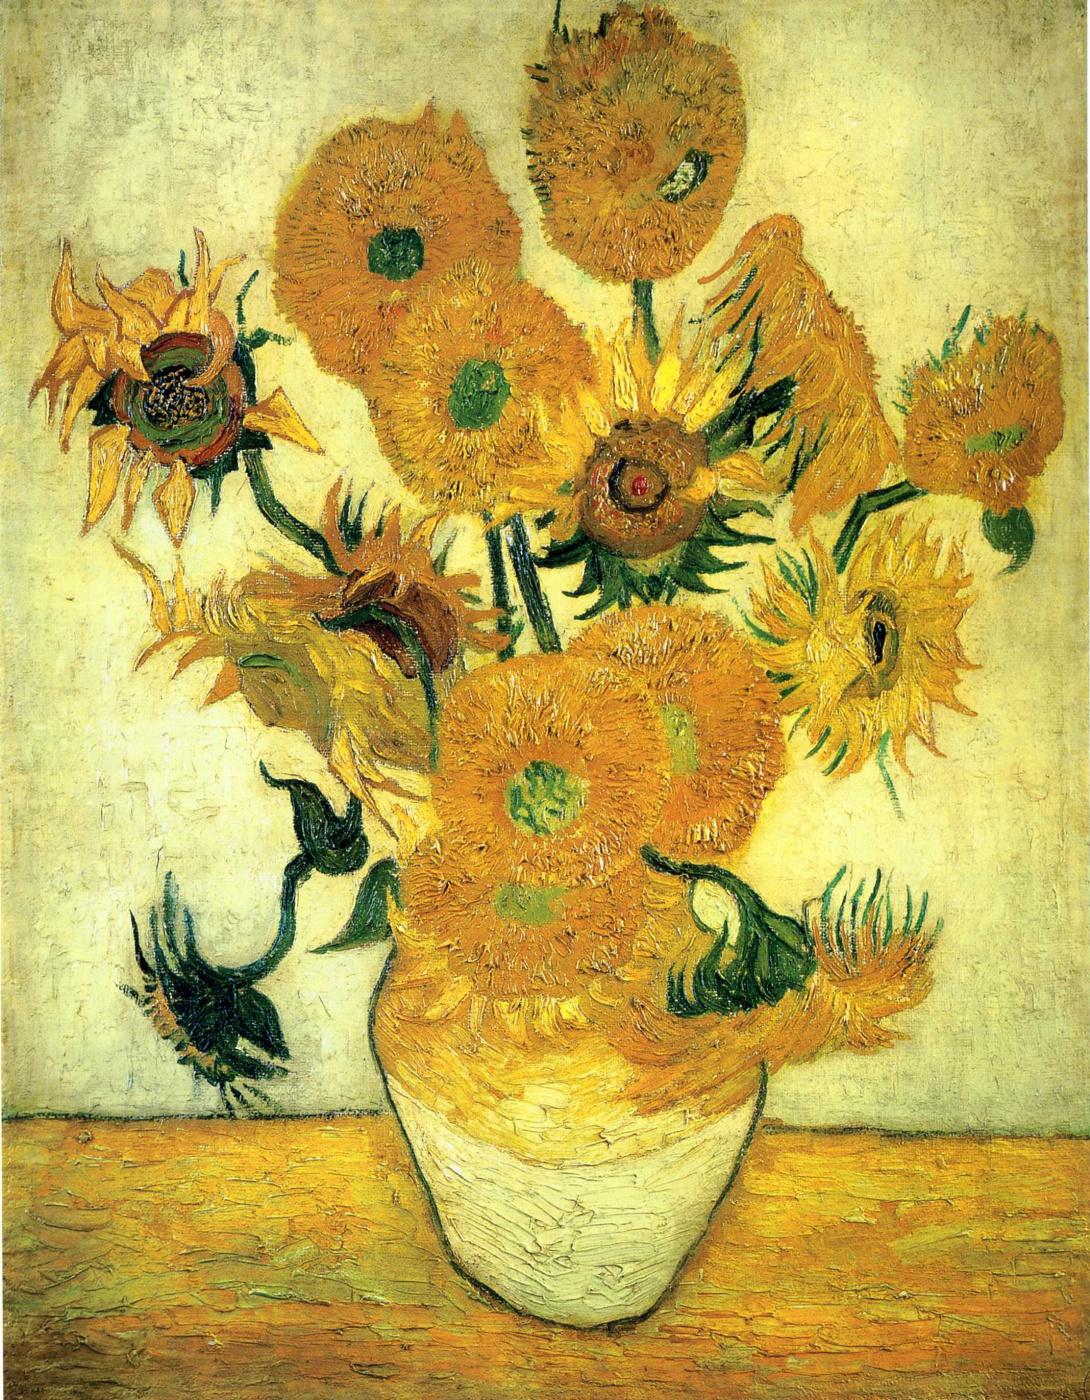 Vincent van Gogh. Sunflowers in a vase